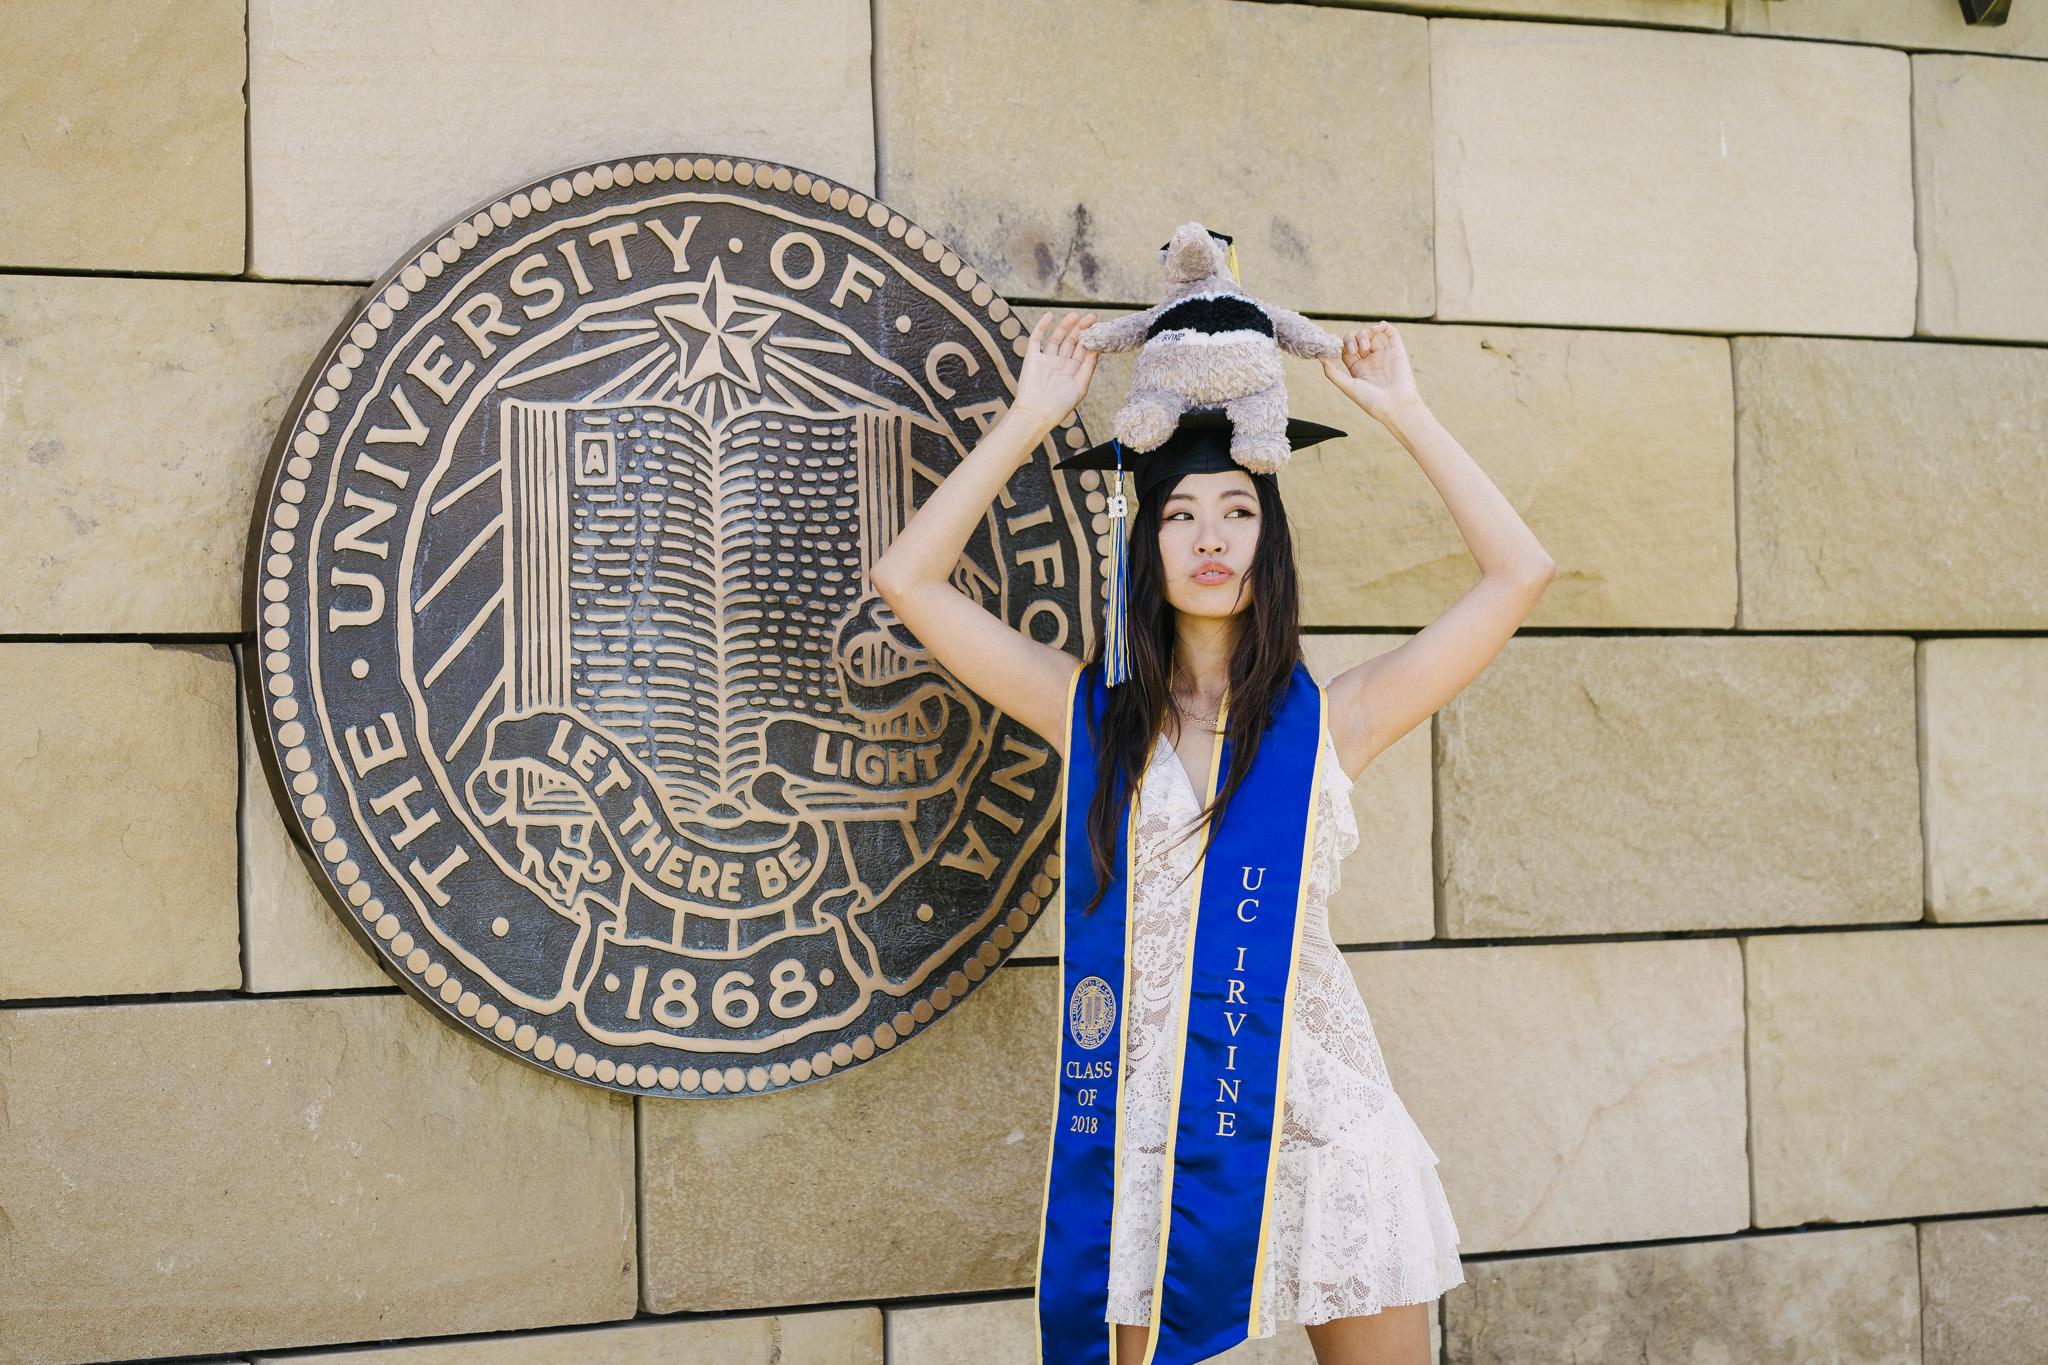 [5-16-2018] Vi's Graduation Photoshoot26.jpg